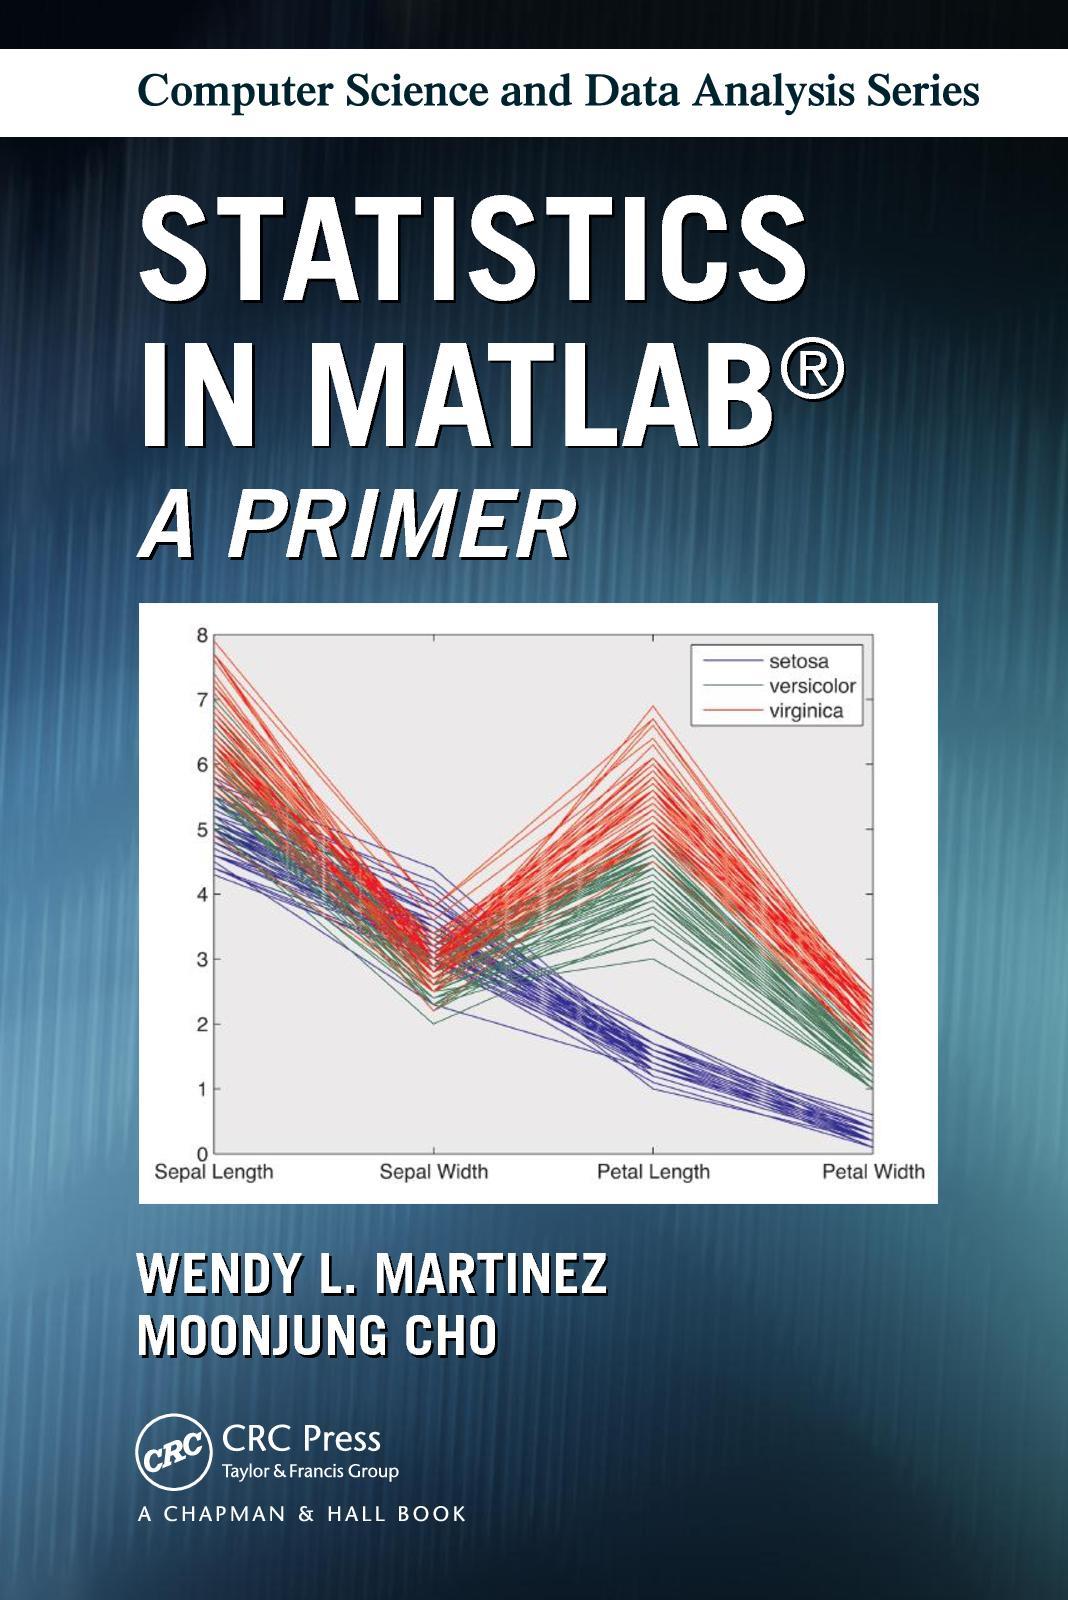 Calaméo - Matlab A Primer Crc prss